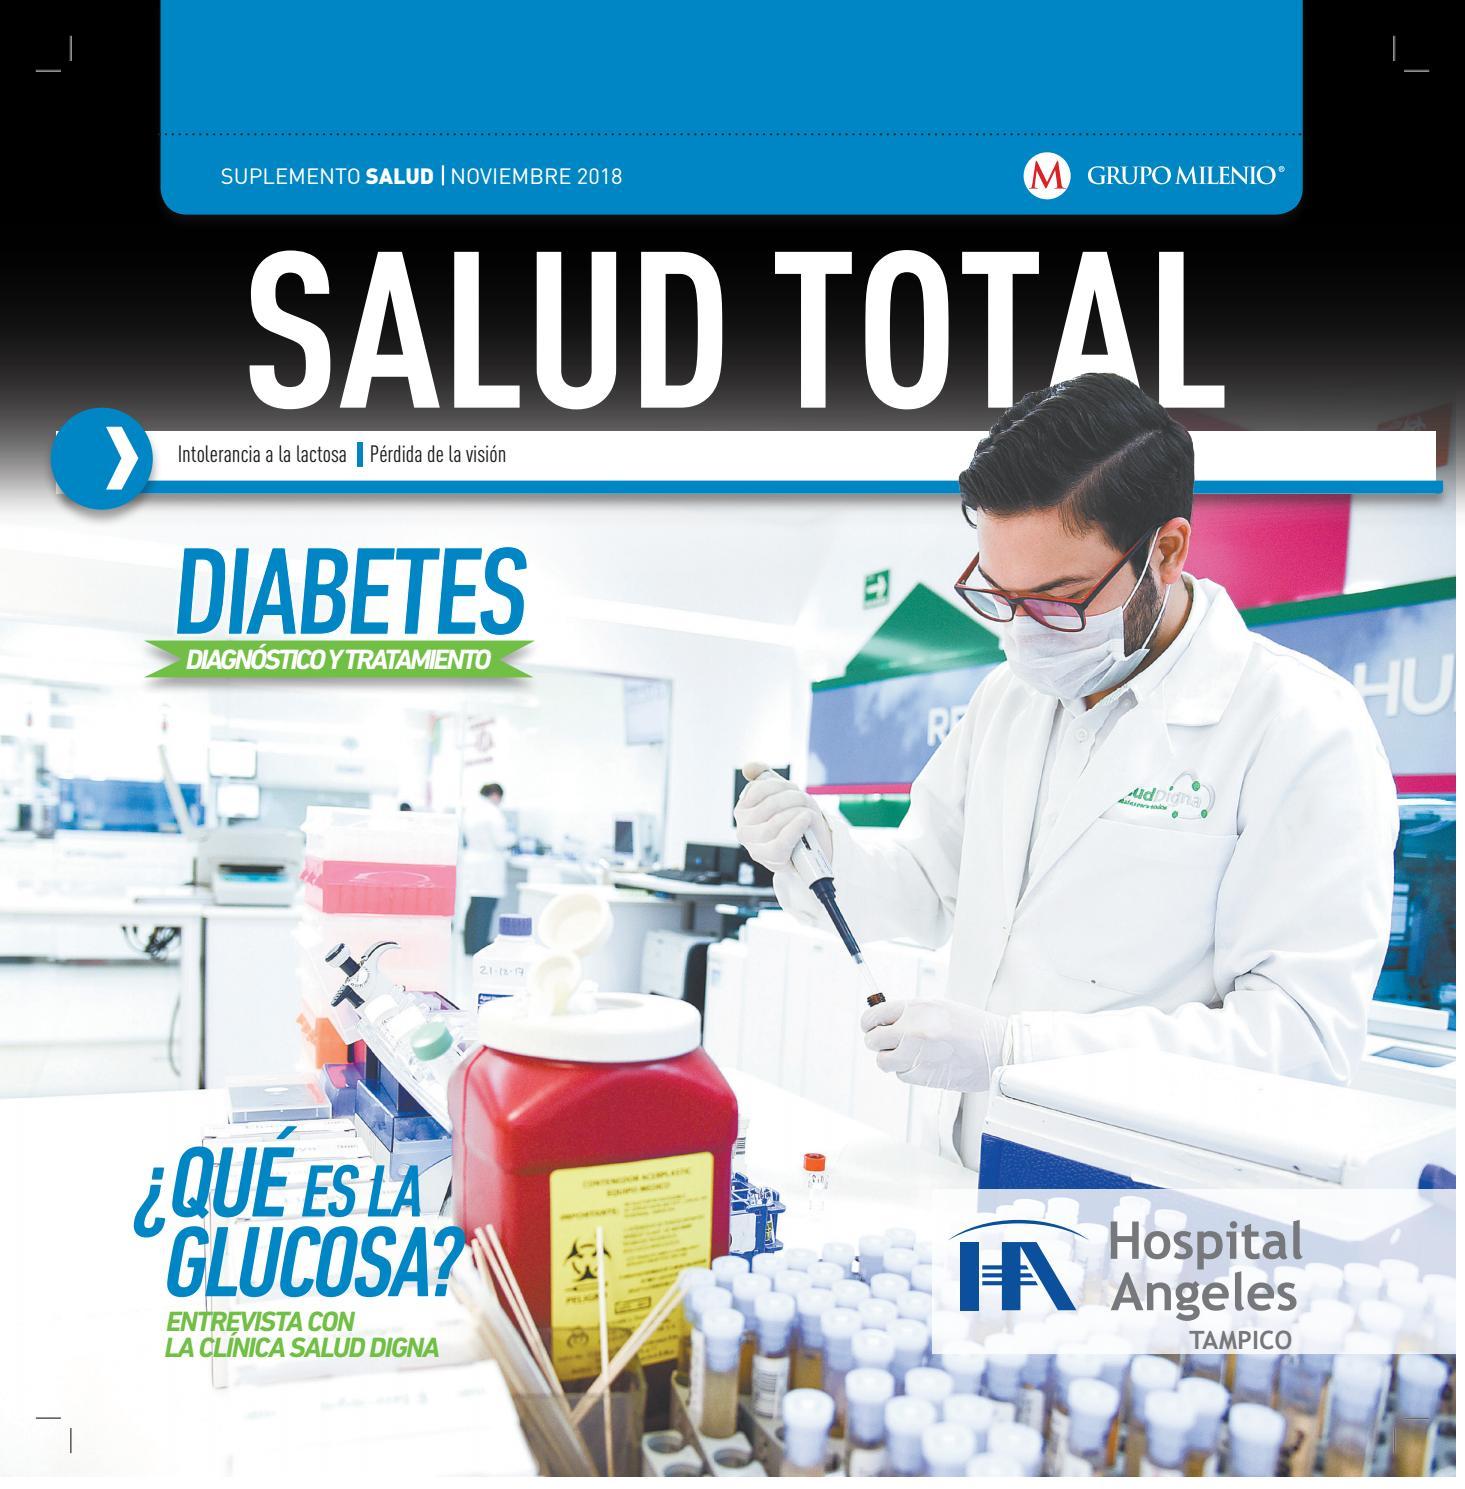 intolerancia a la lactosa diabetes gestacional